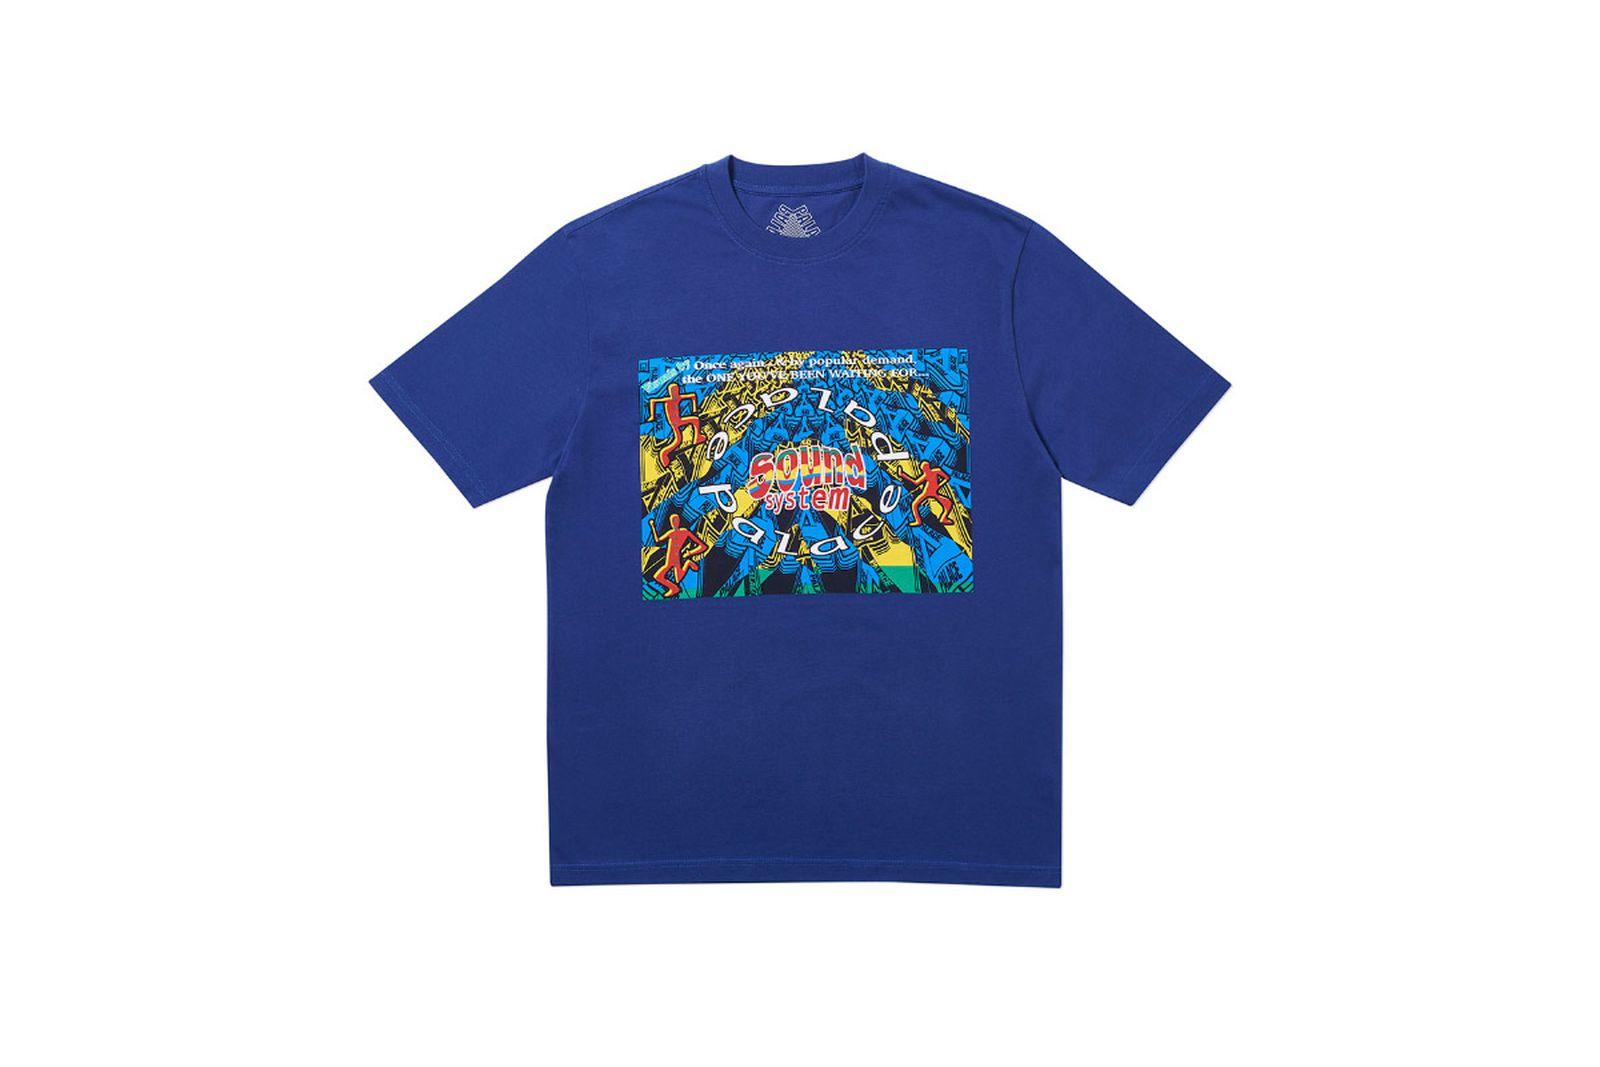 Palace 2019 Autumn T Shirt Sound Mate blue